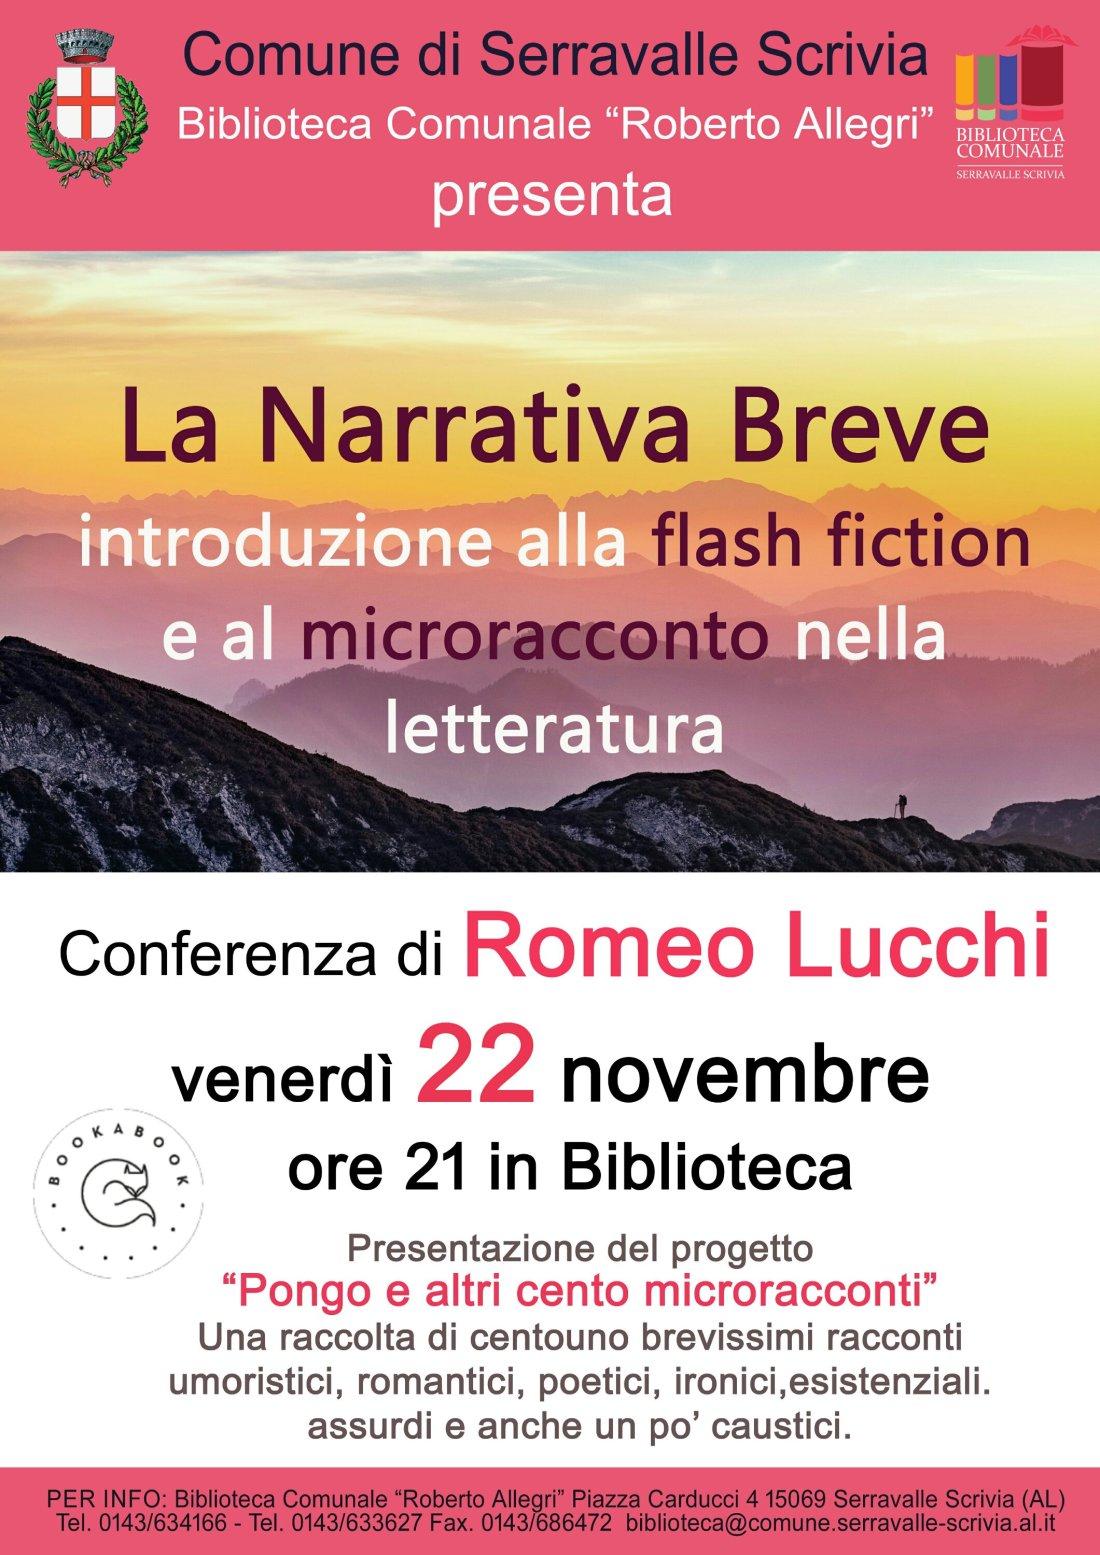 romeo lucchi_22 novembre2063338897..jpg